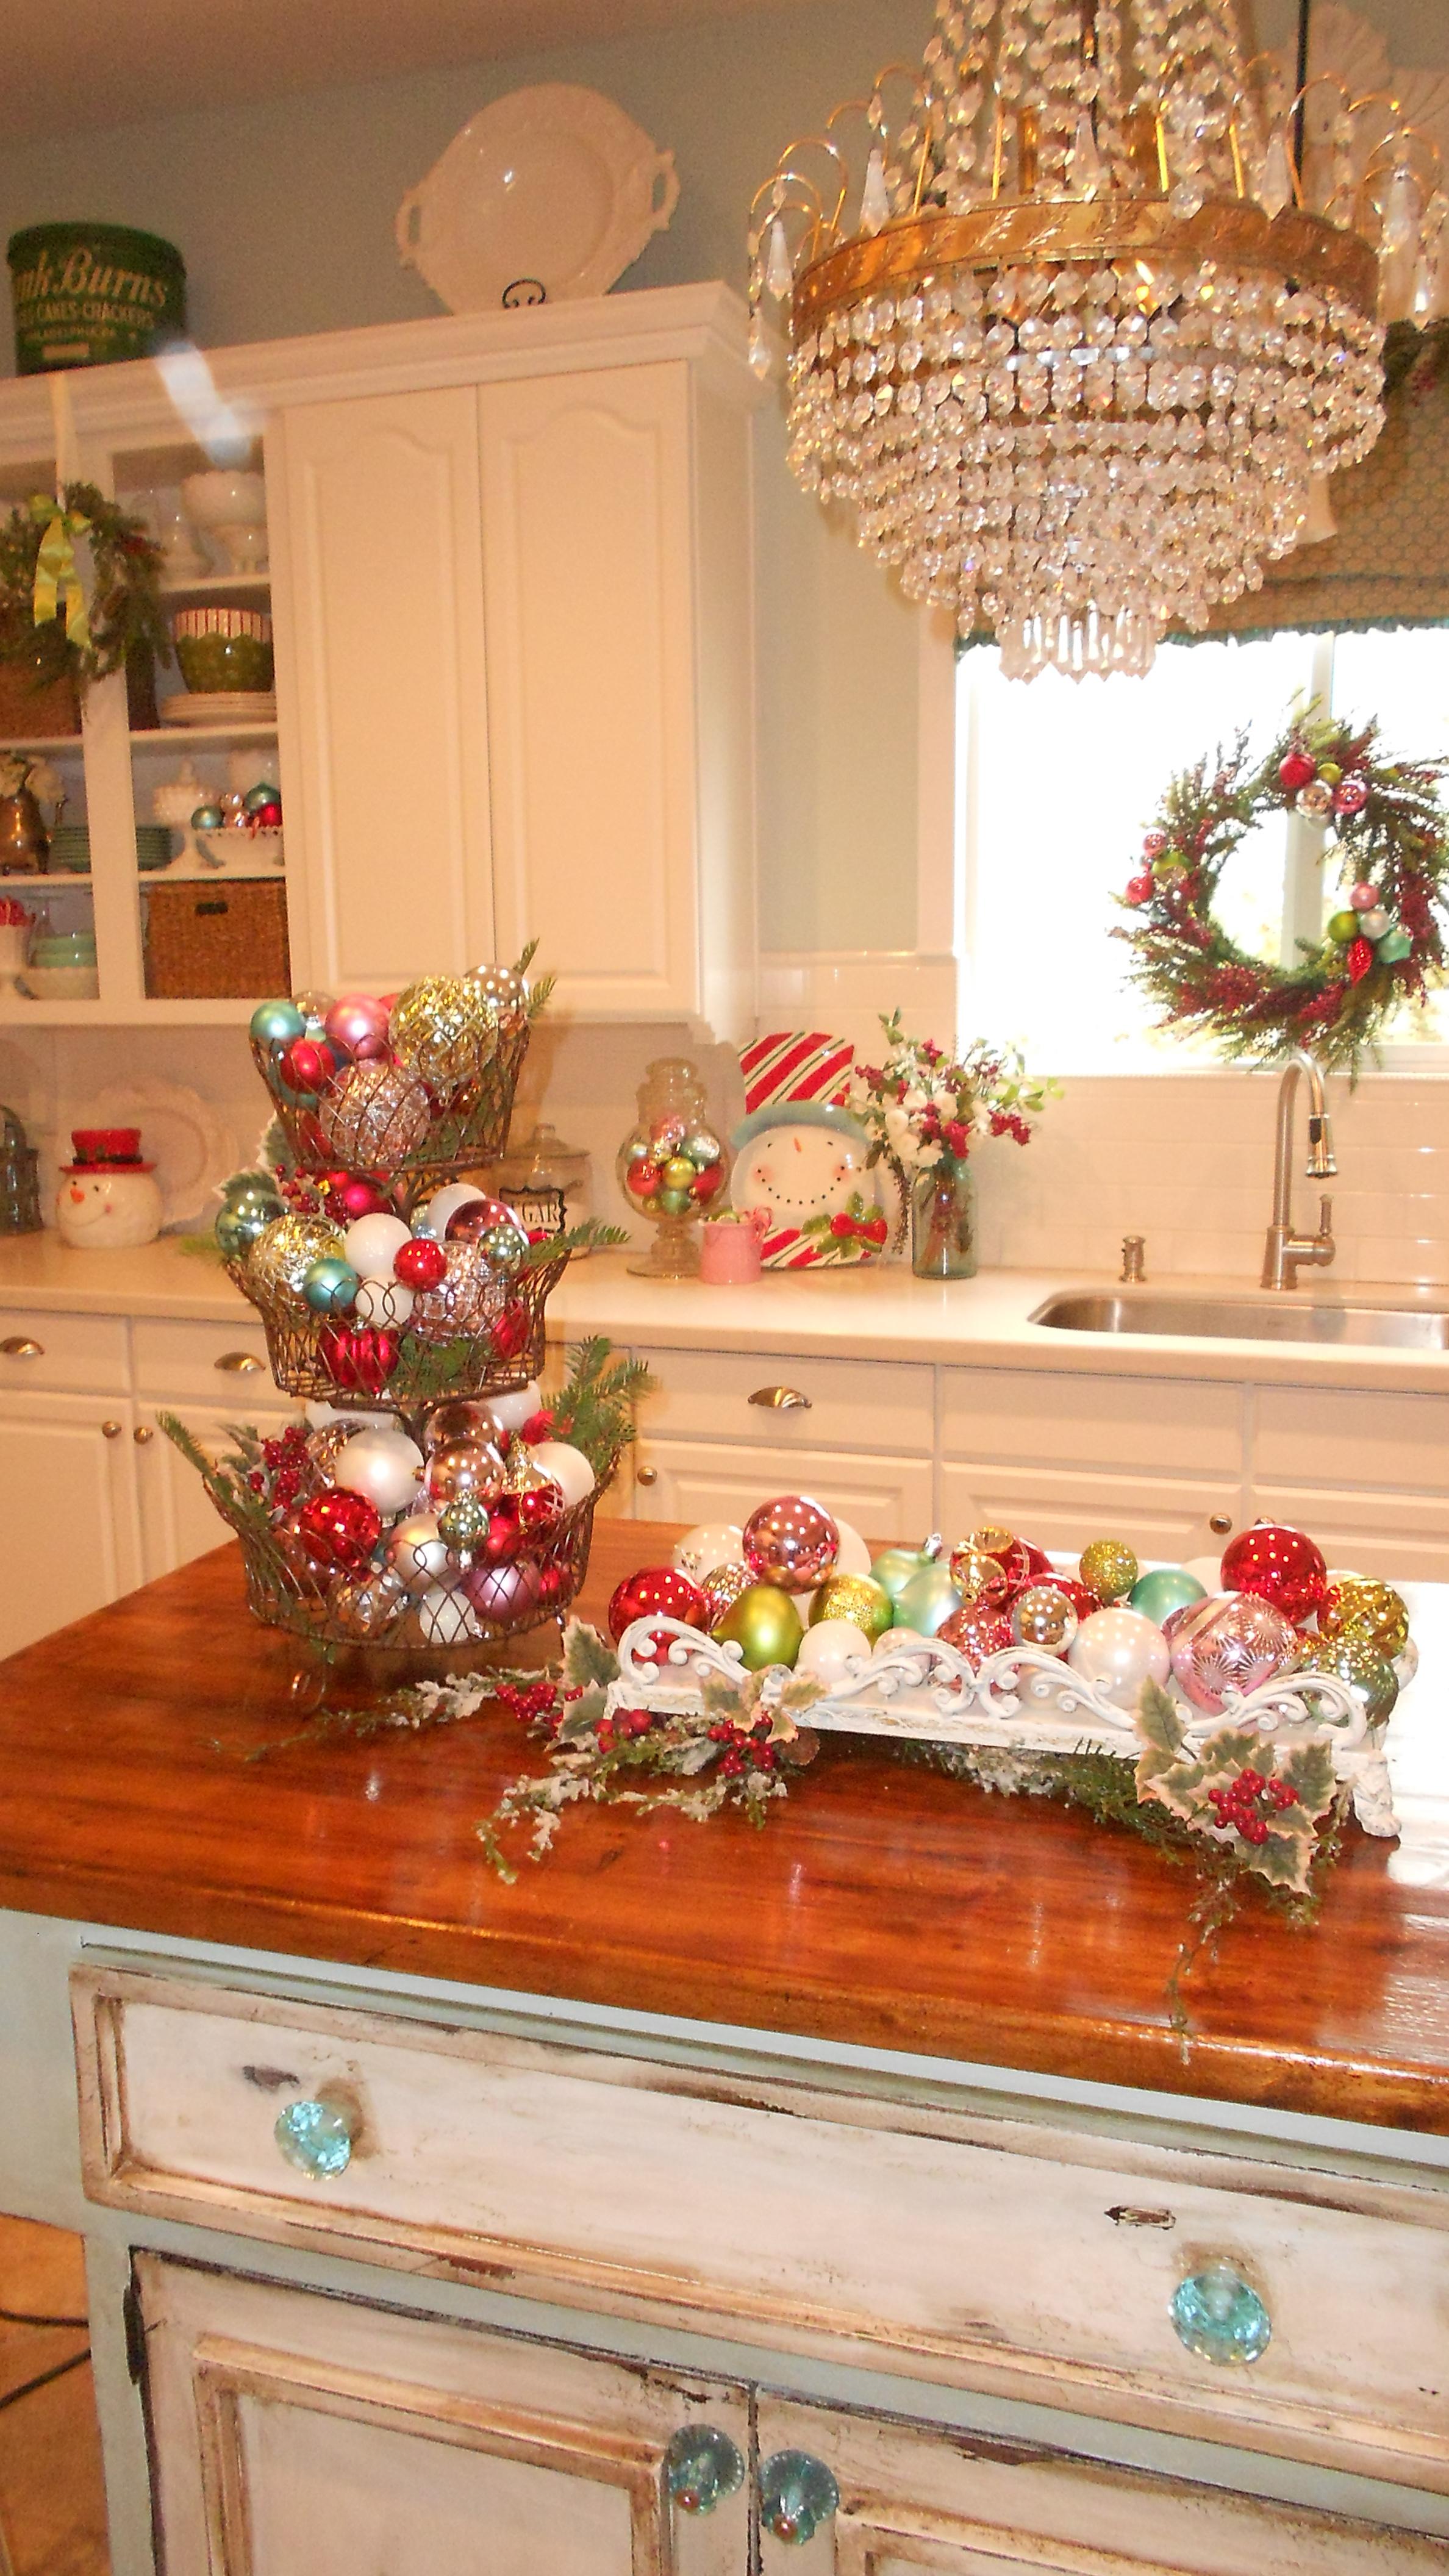 pinterest-christmas-kitchen